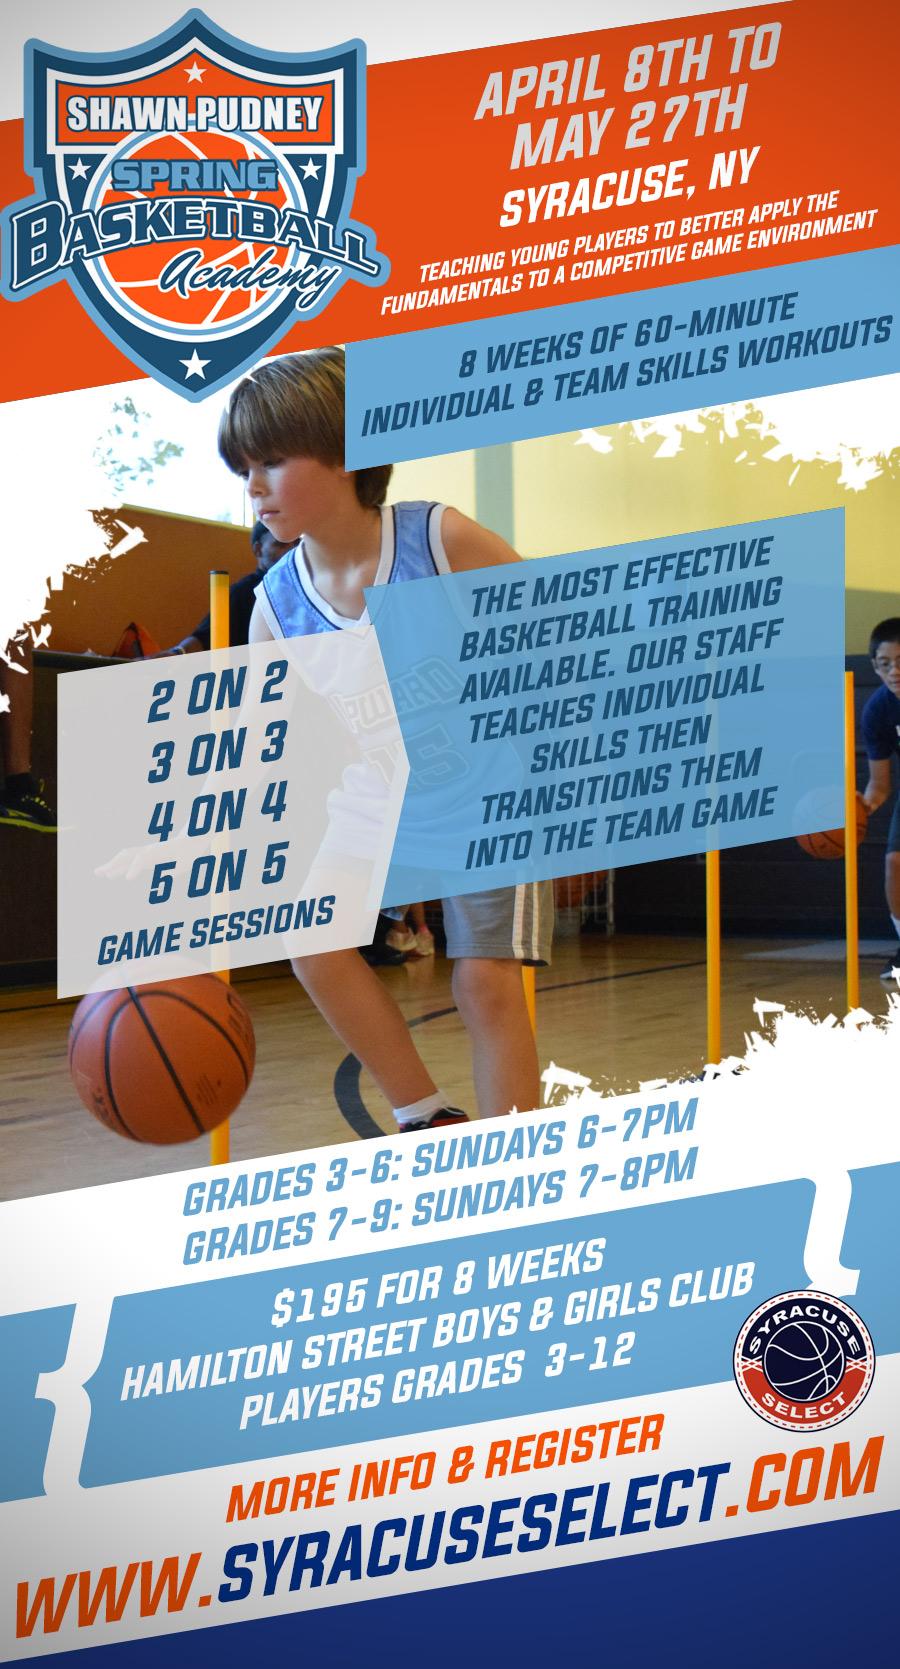 Spring Basketball Academy